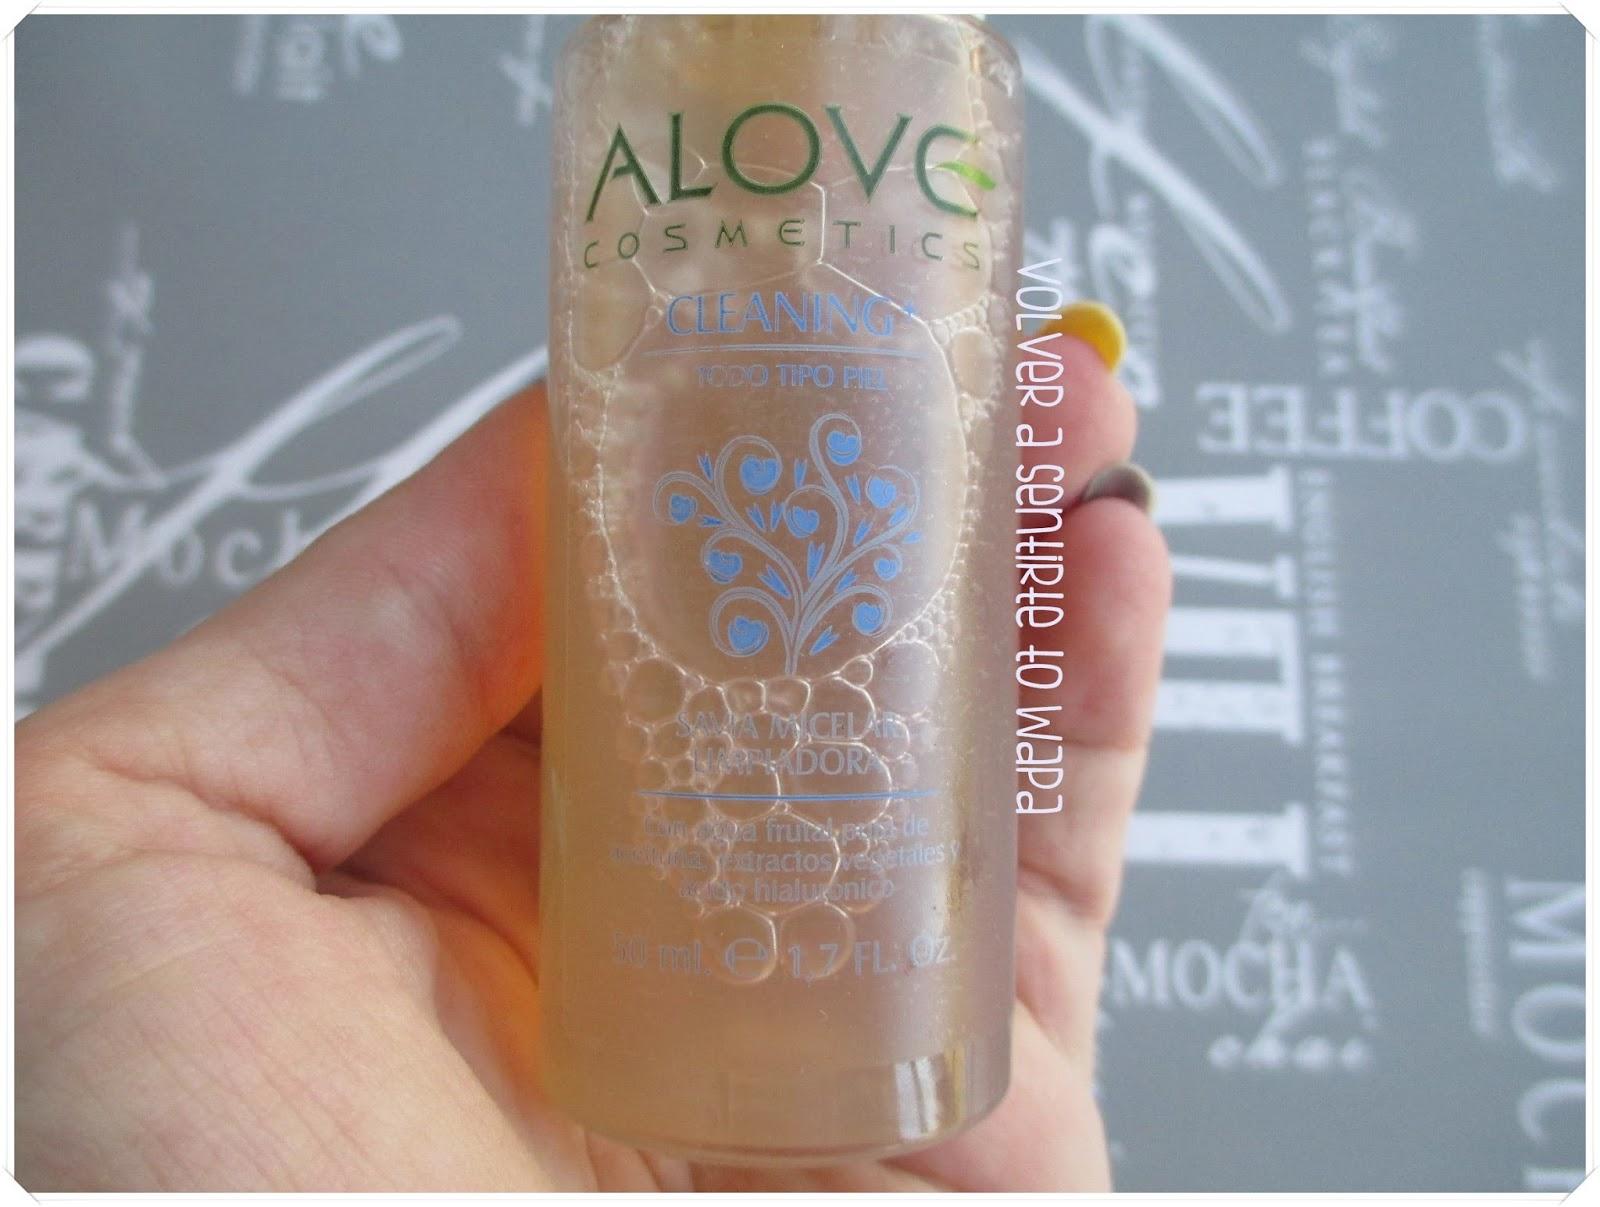 Alove Cosmetics - Gama Cleaning+ - Savia Micelar